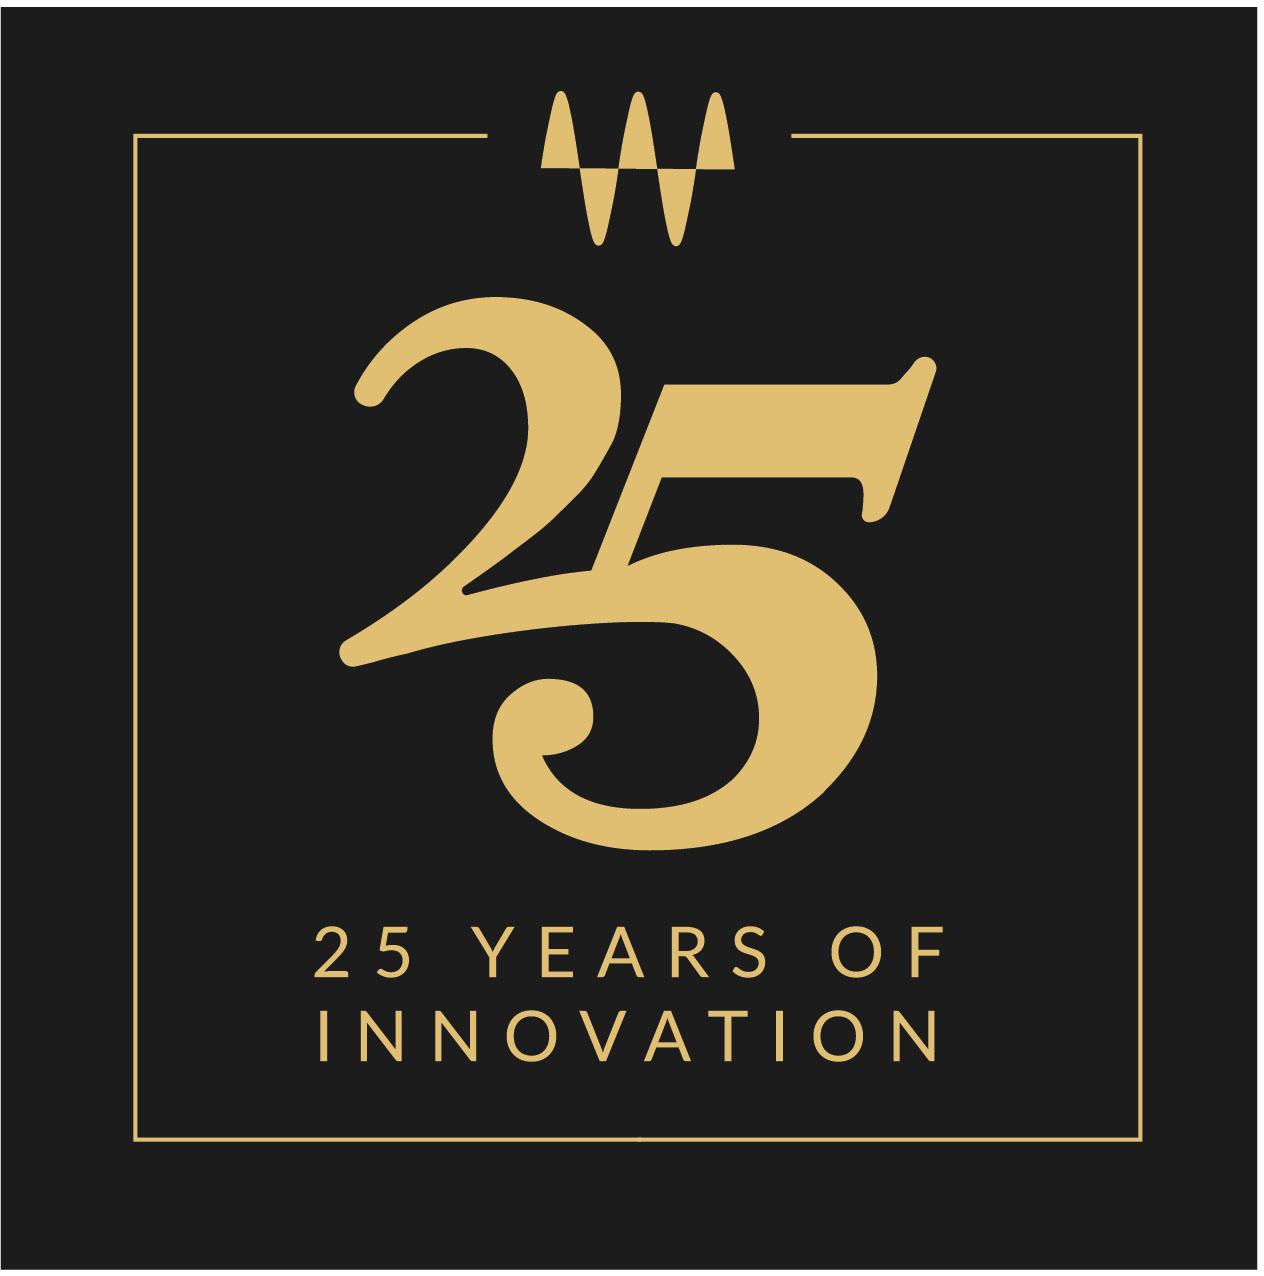 http://www.clynemedia.com/waves/25thAnniv/Waves_25thAnniv_Logo.jpg